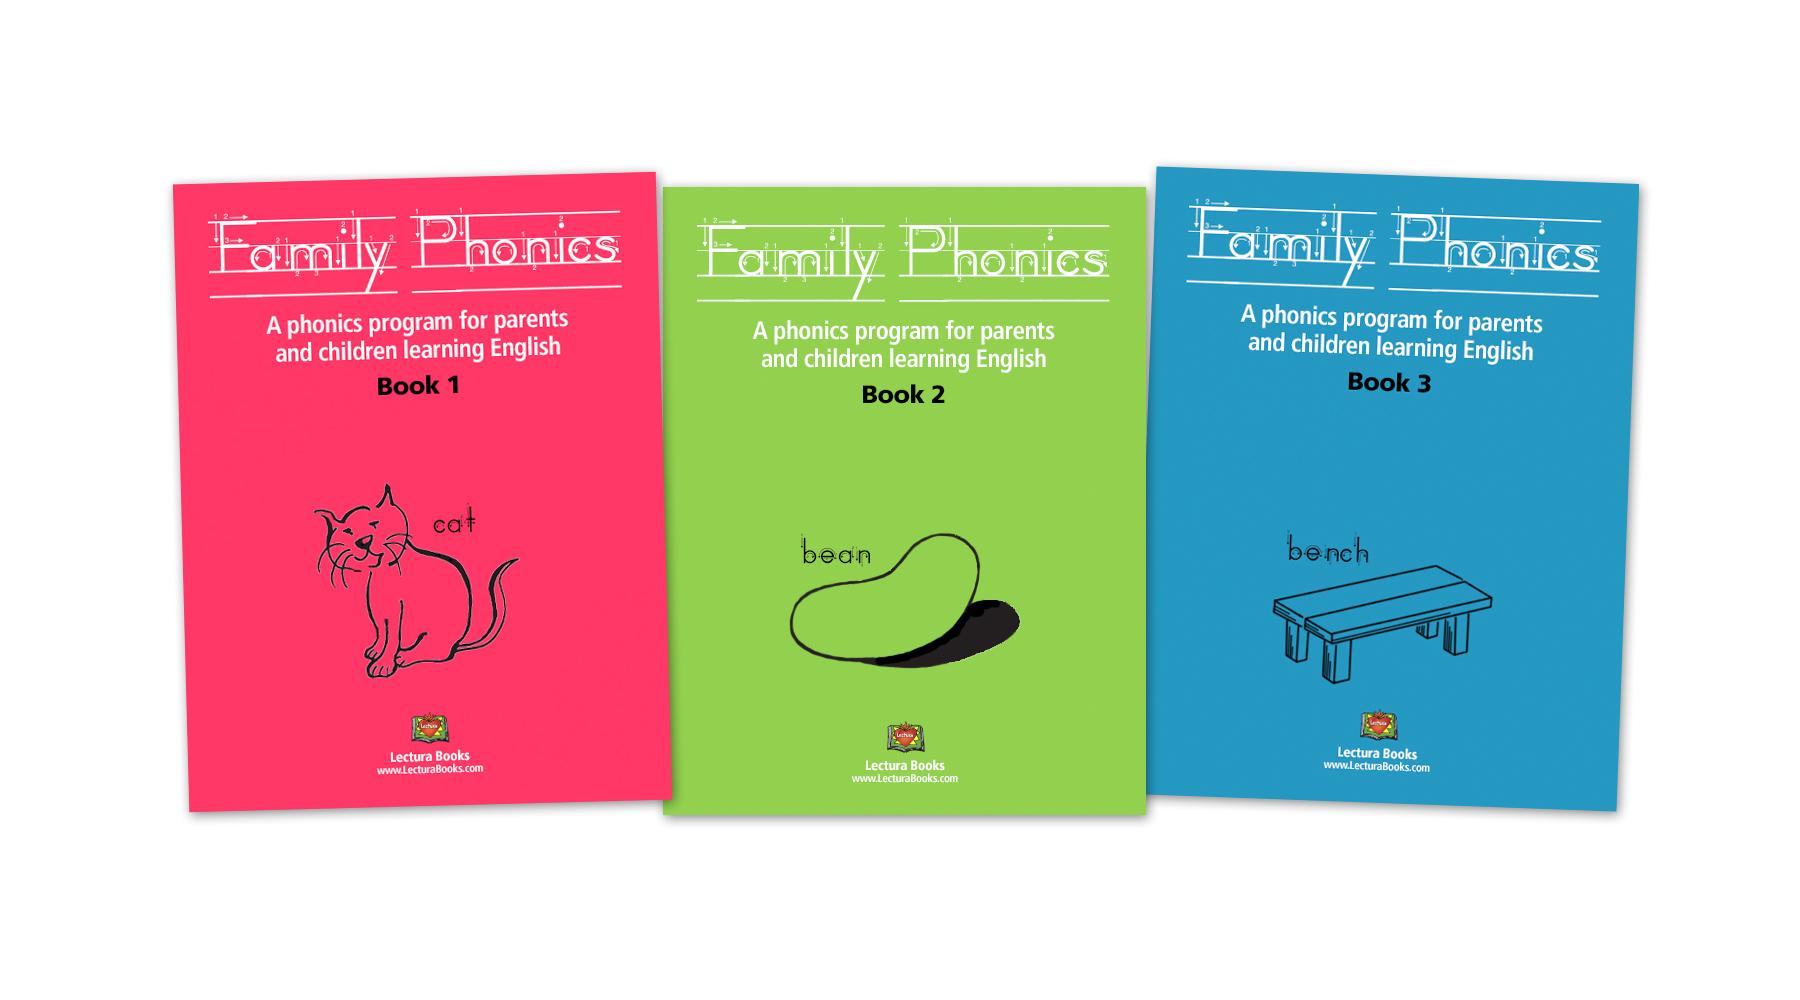 Family Phonics books for bilingual (English Spanish) parent involvement